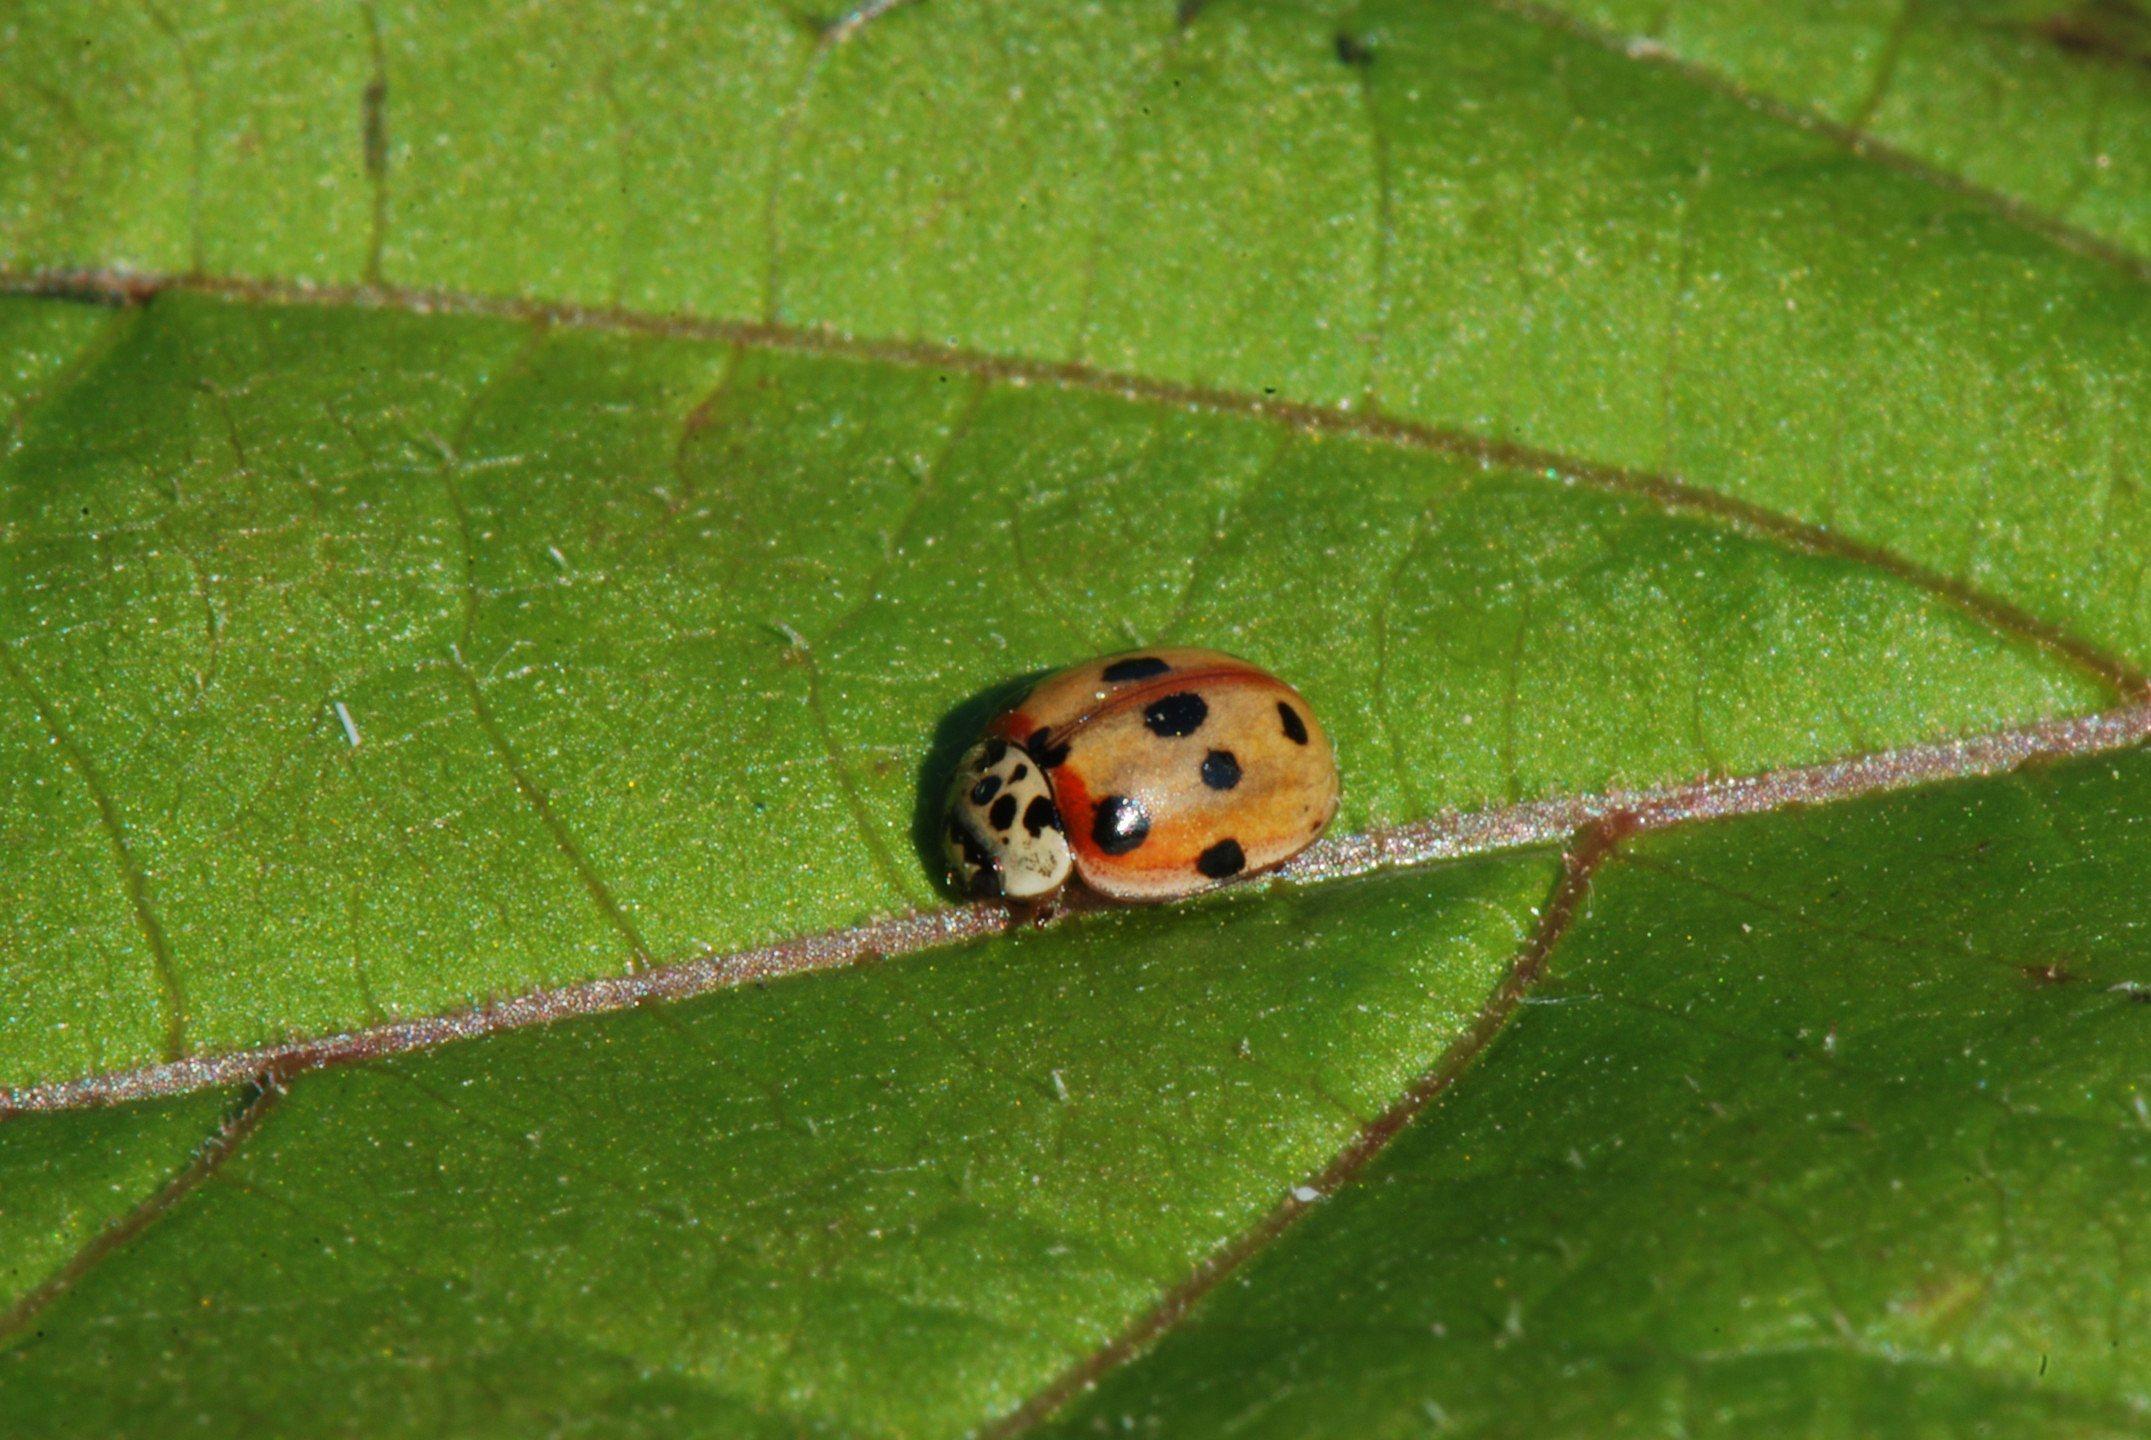 Adalia decimpuntata, the 10-spot Ladybird